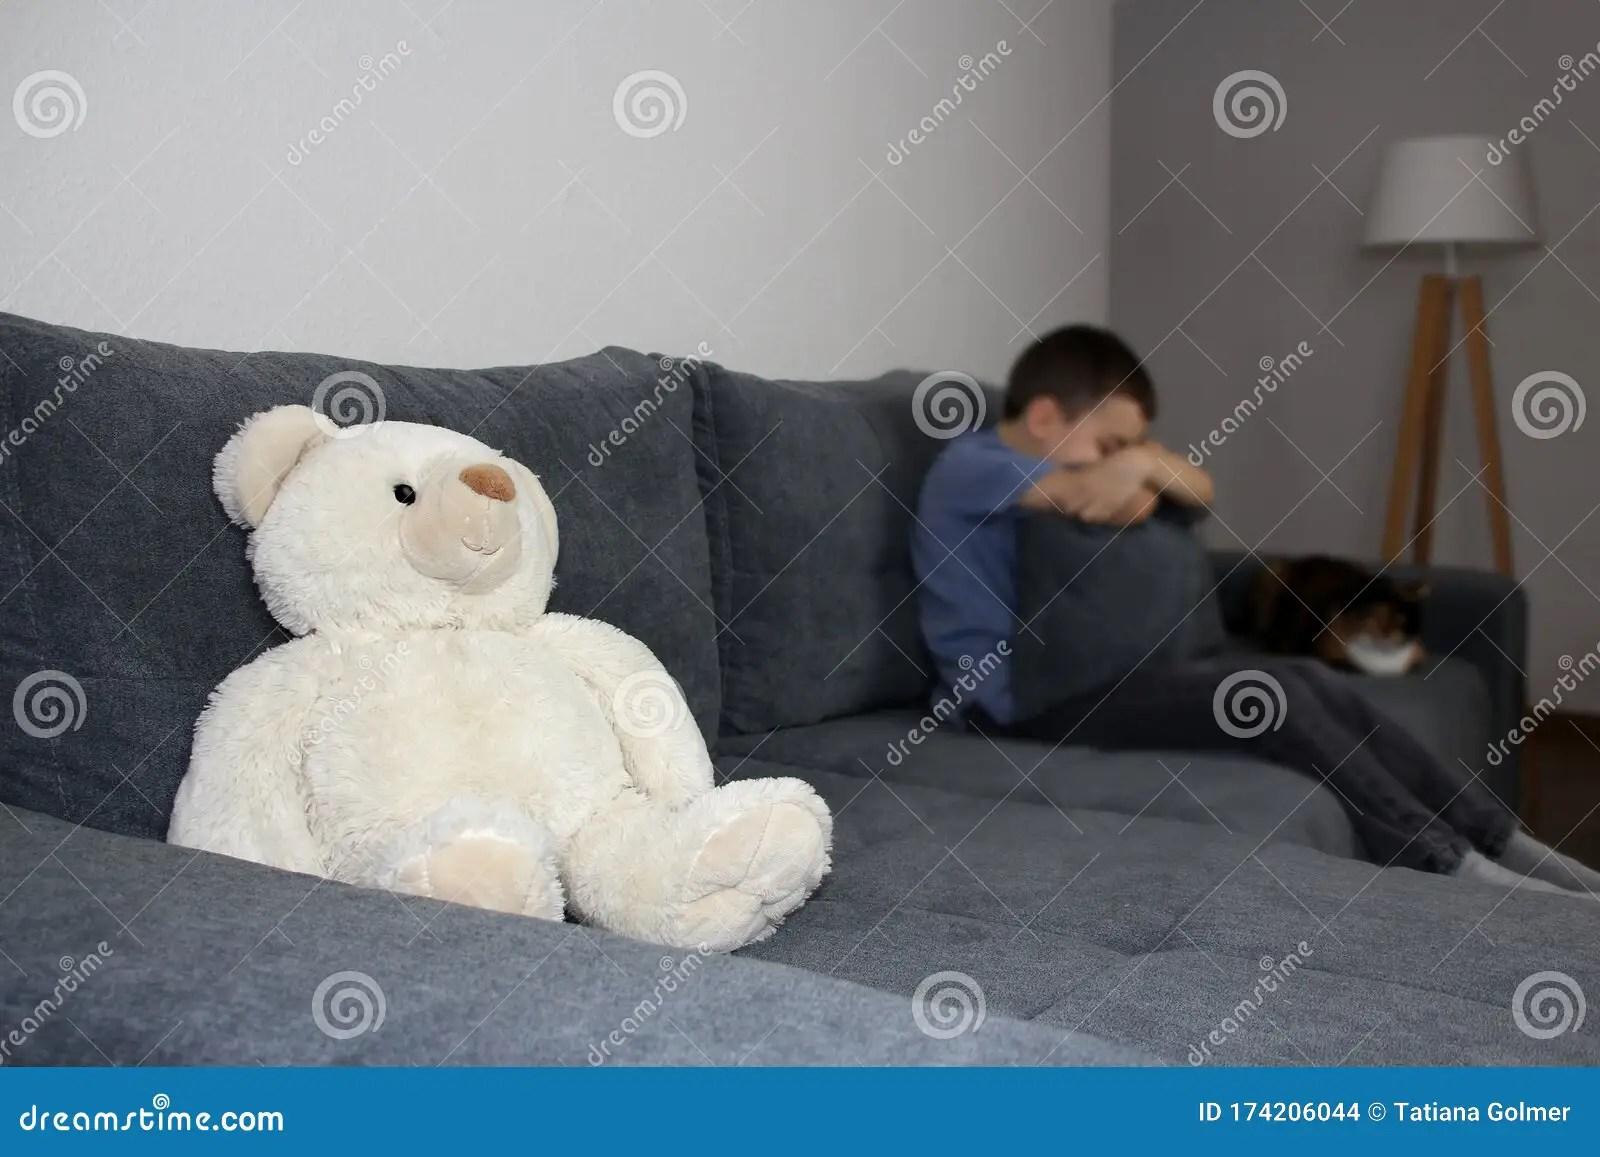 https www dreamstime com sad kid boy defocus hid his face pillow teddy polar bear focus sits couch childhood concept image174206044